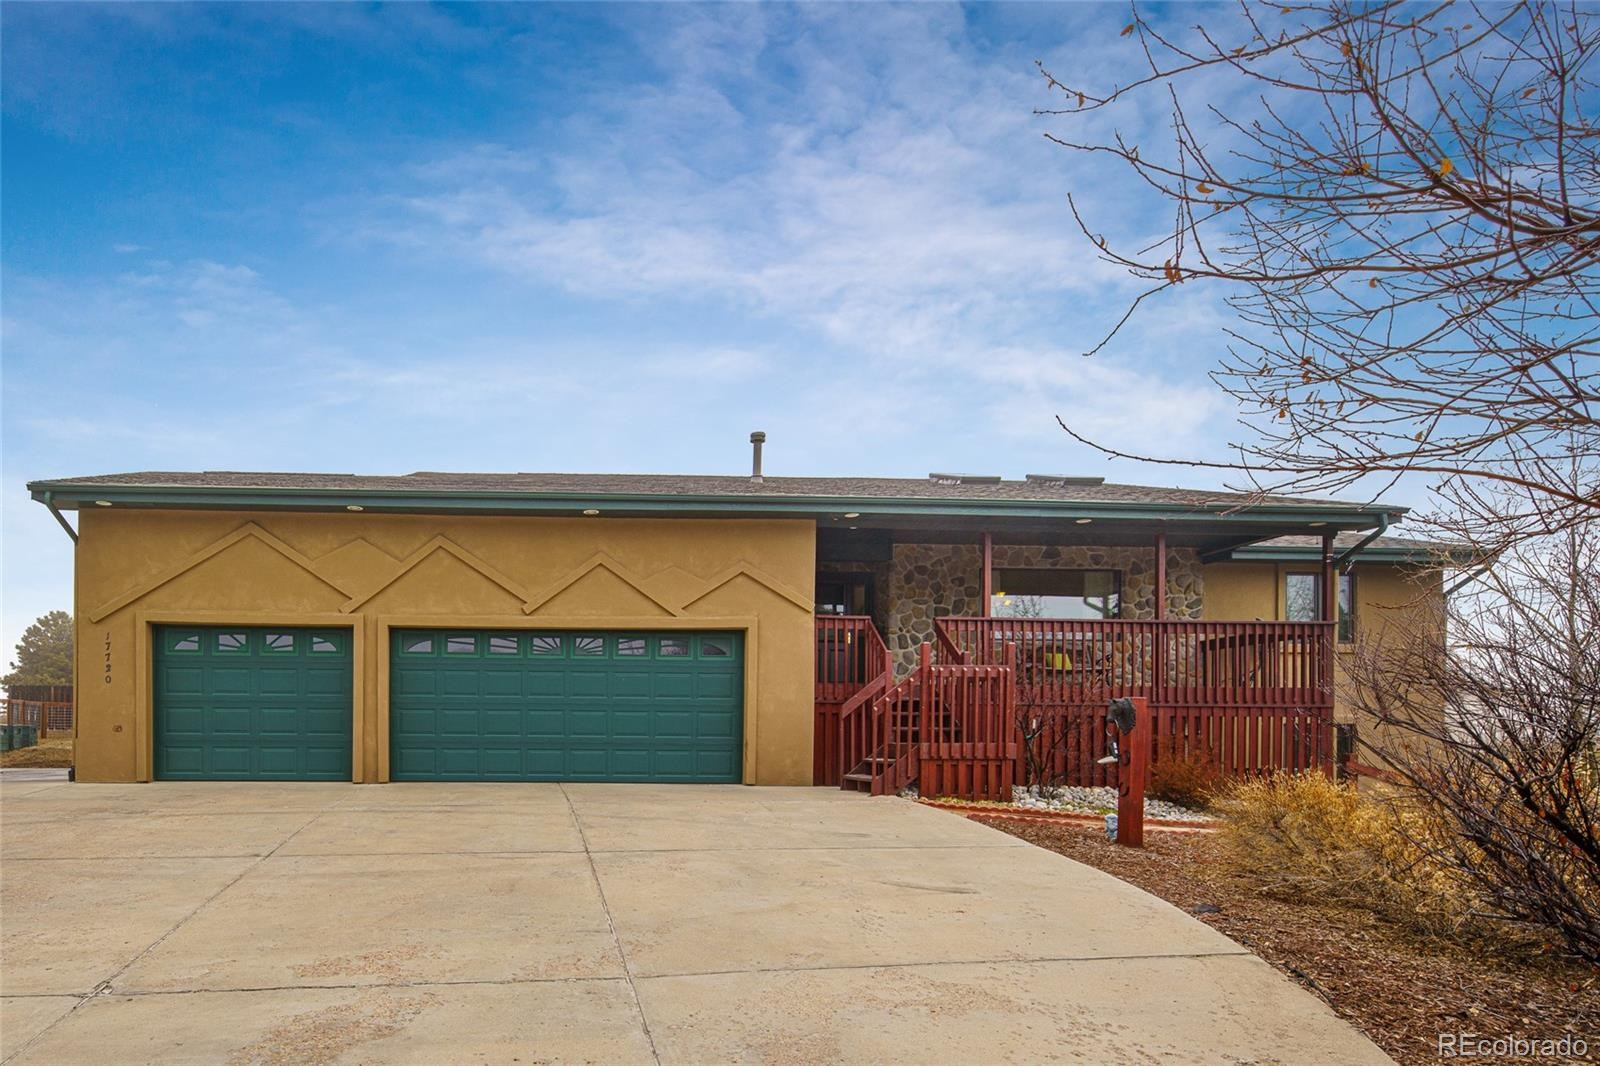 MLS# 9205685 - 6 - 17720 Pioneer Crossing, Colorado Springs, CO 80908